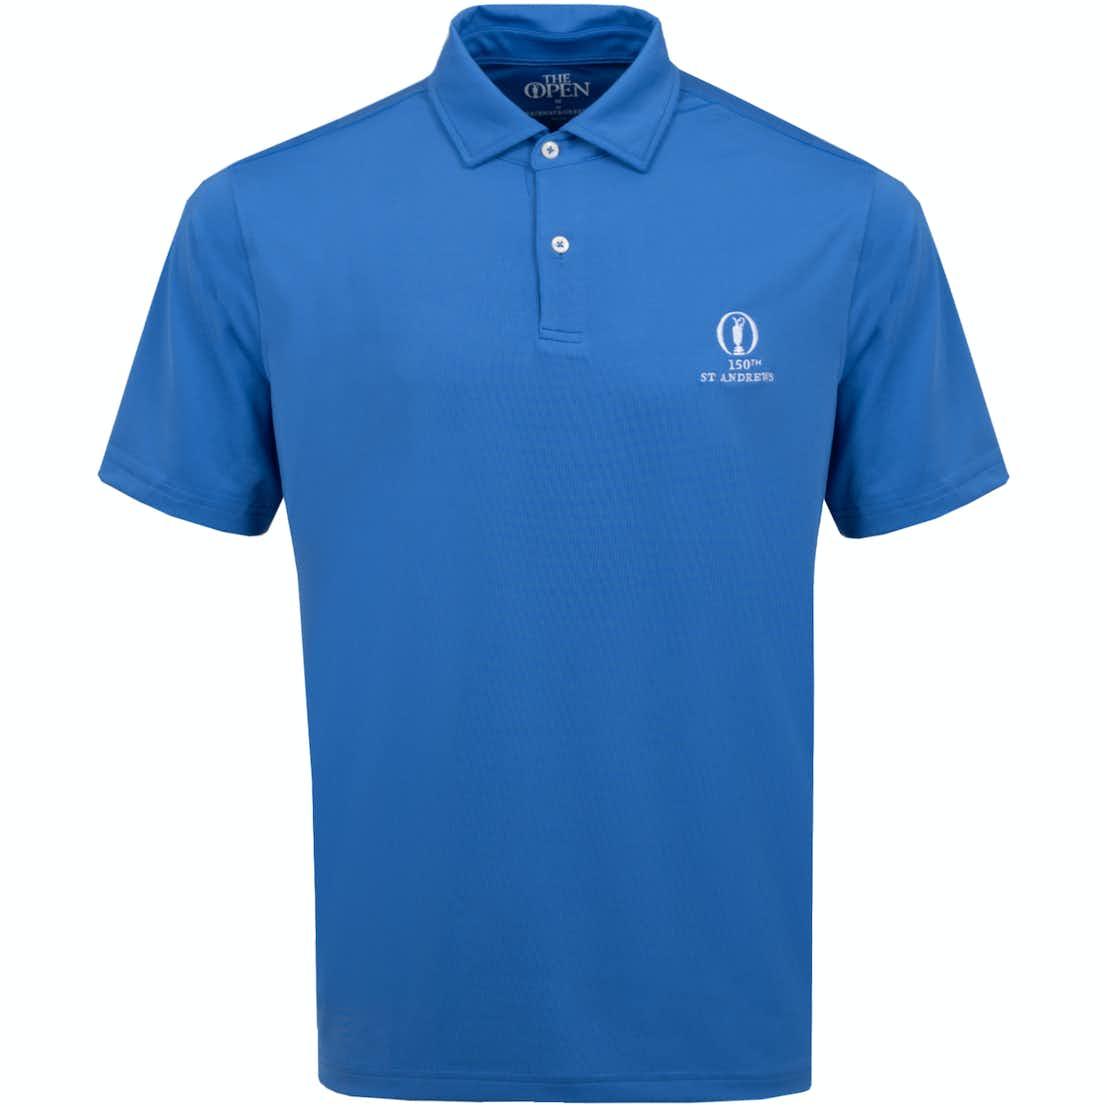 150th St Andrews Plain Polo Shirt - Blue